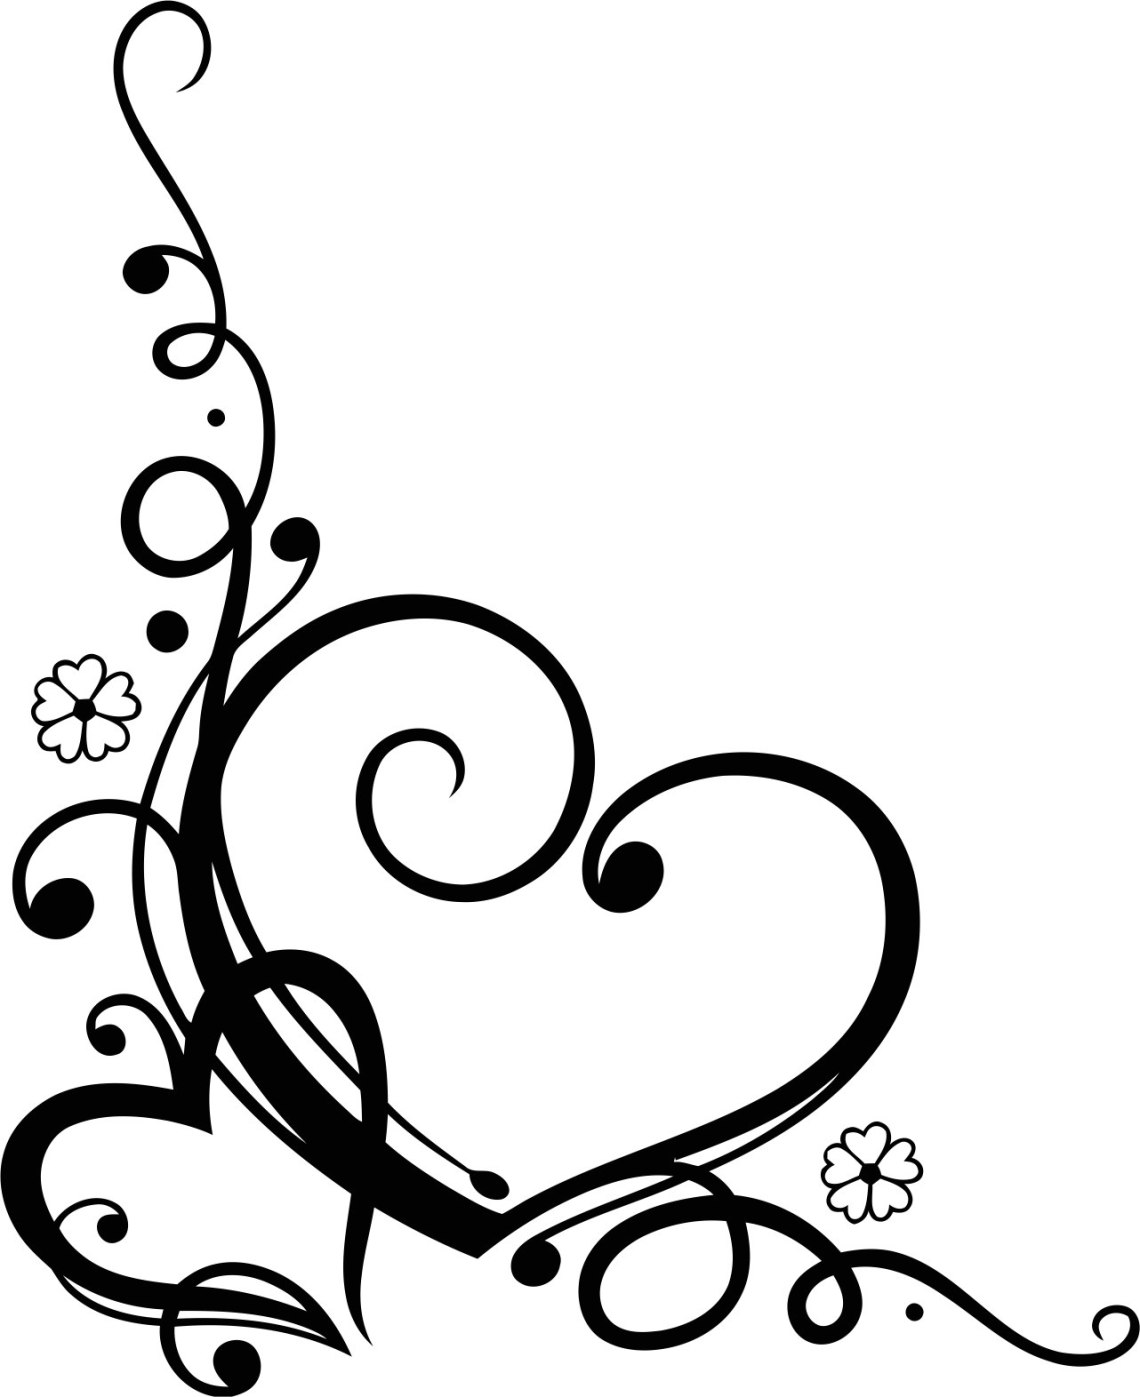 Download Love Heart Floral Swirl Vector Free Vector cdr Download ...